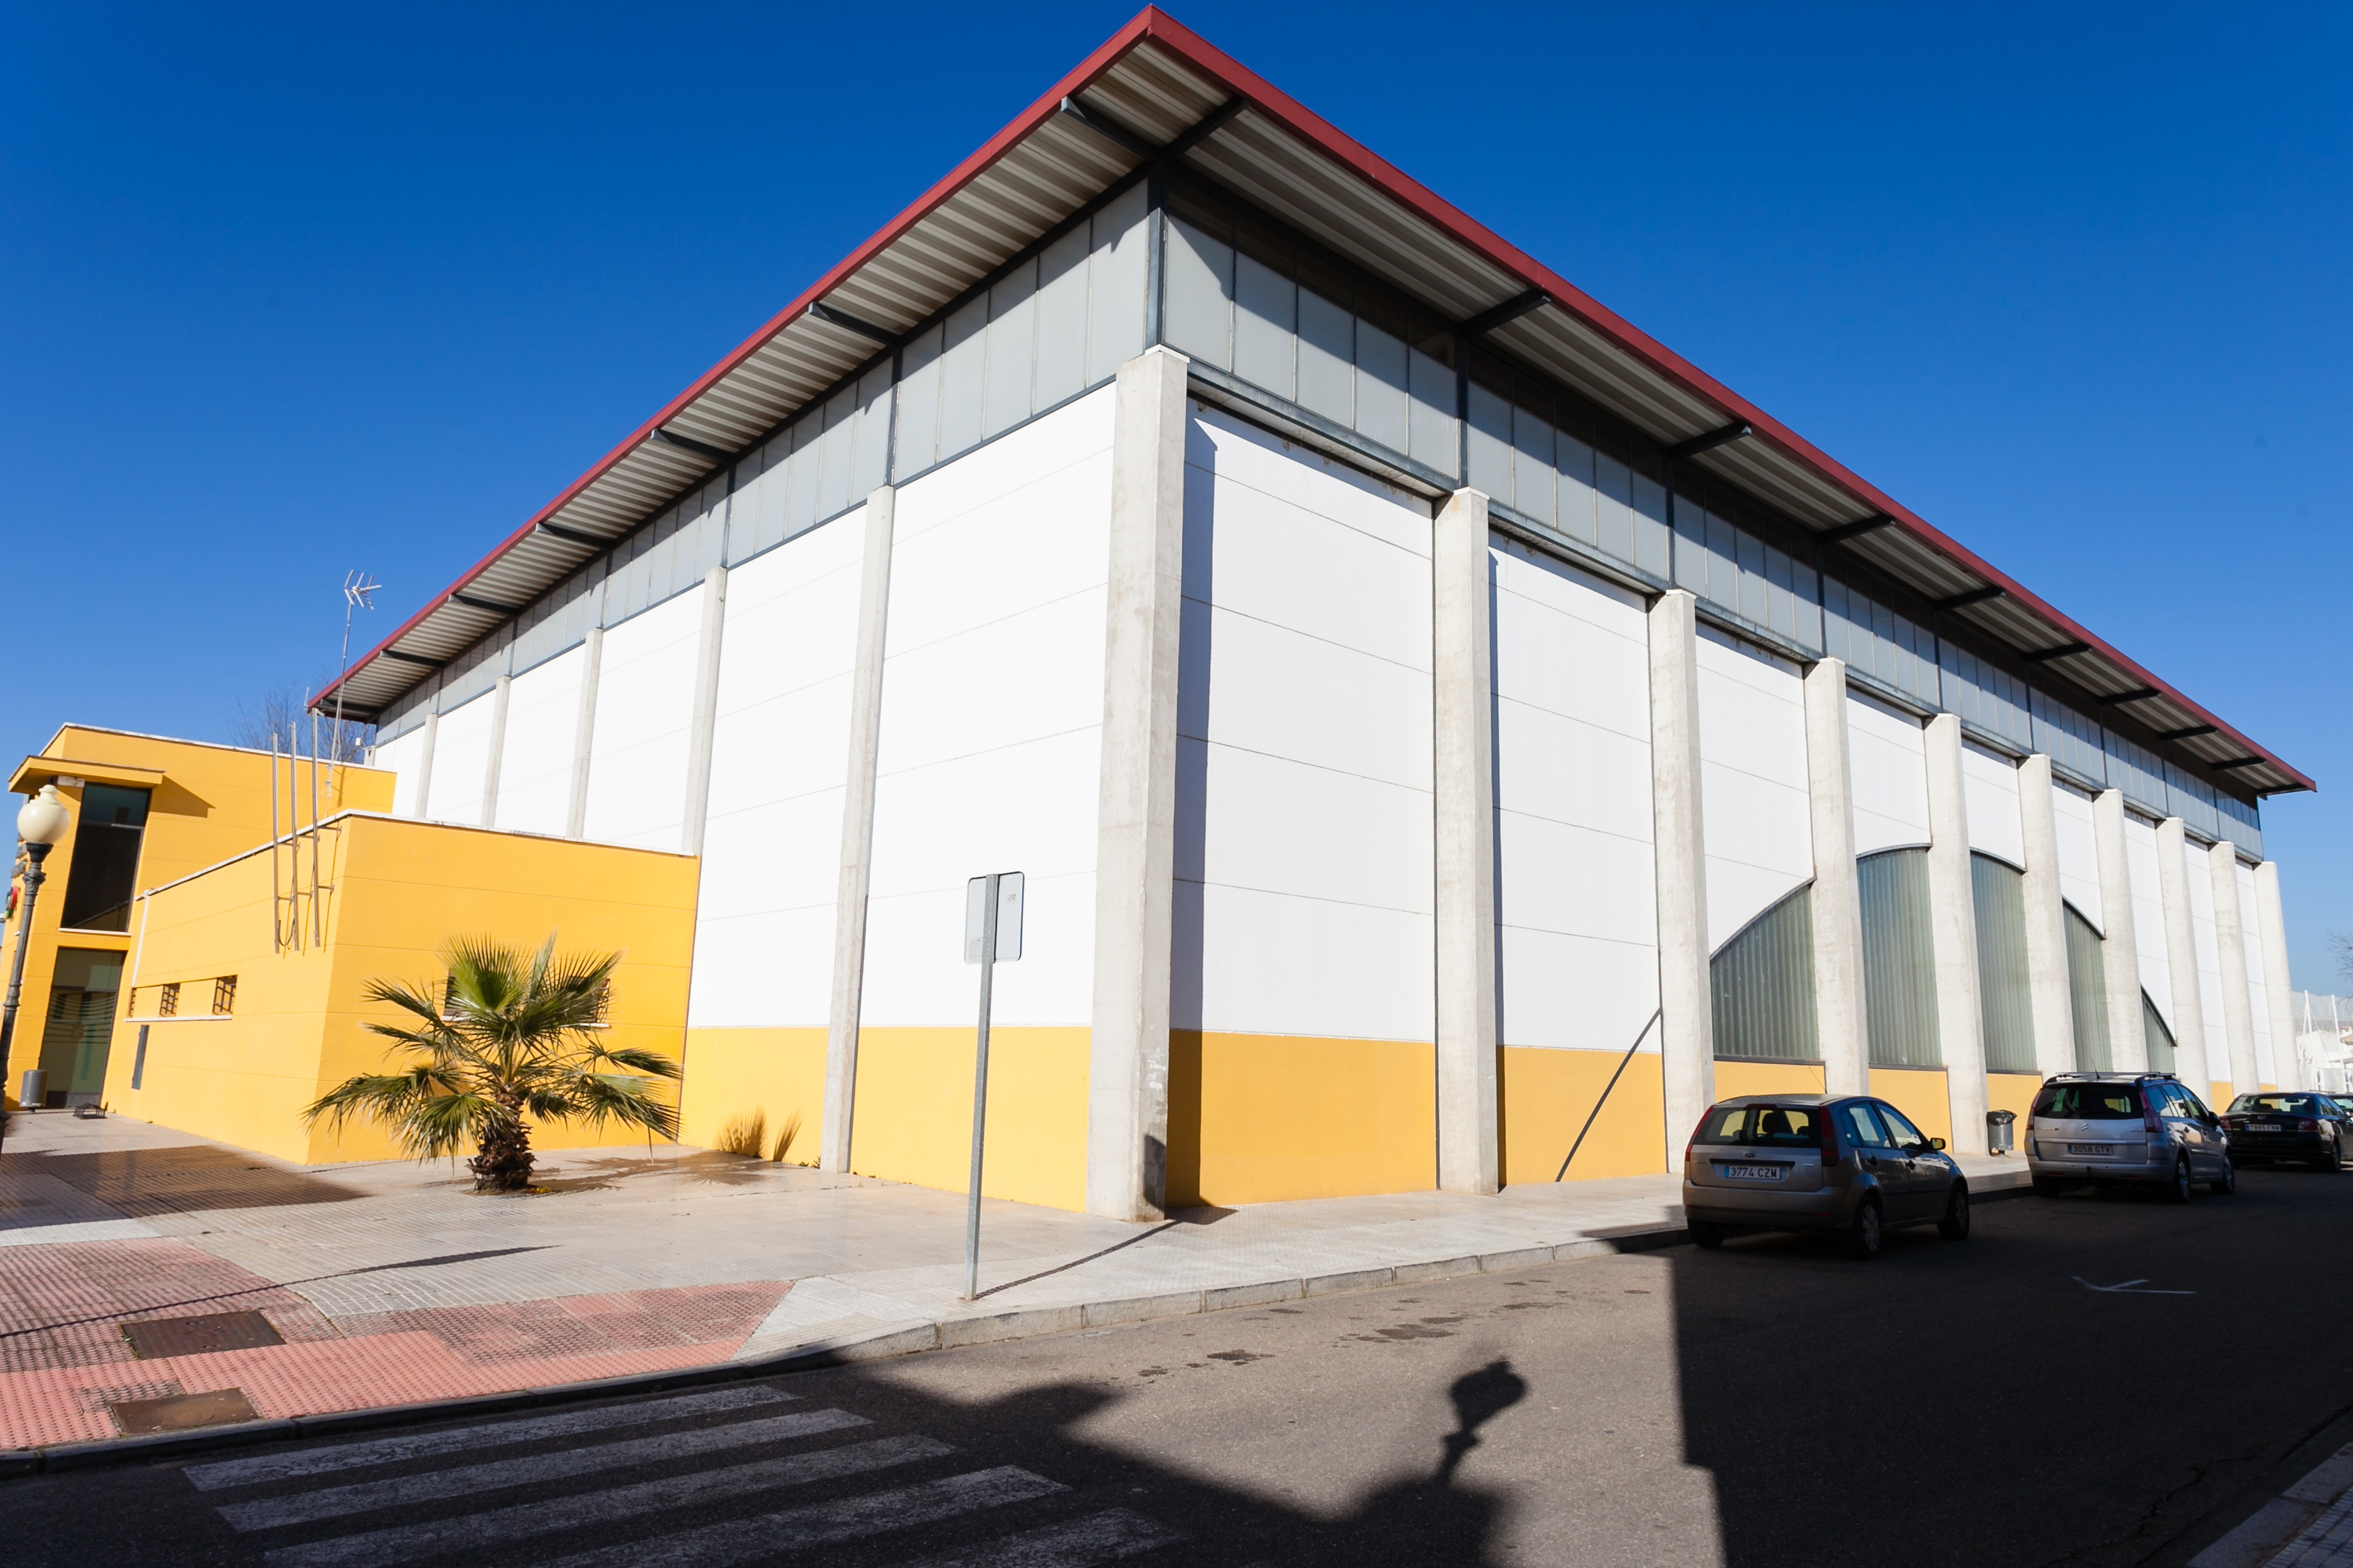 Pabellón polideportivo Rafael Lozano 2